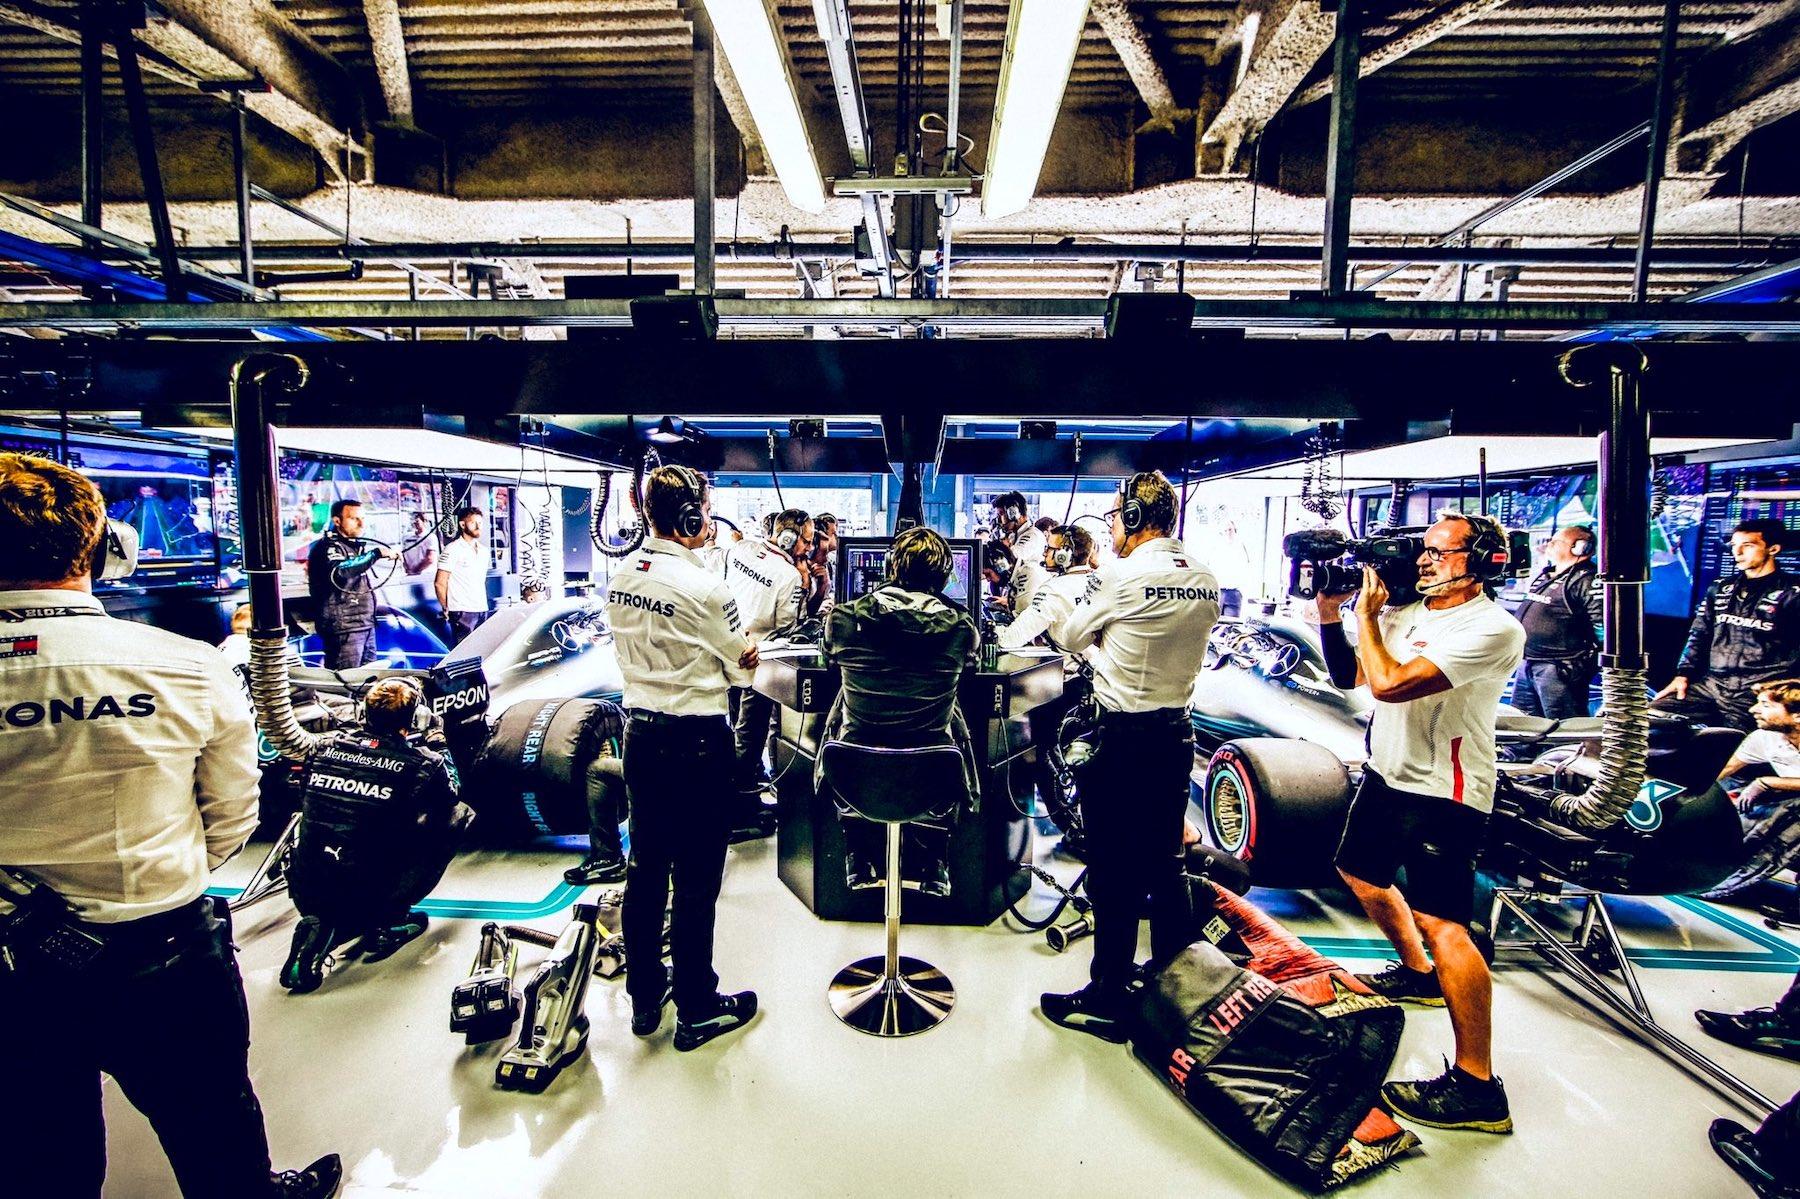 3 2018 Mercedes pits | 2018 USGP FP1 1 copy.jpg